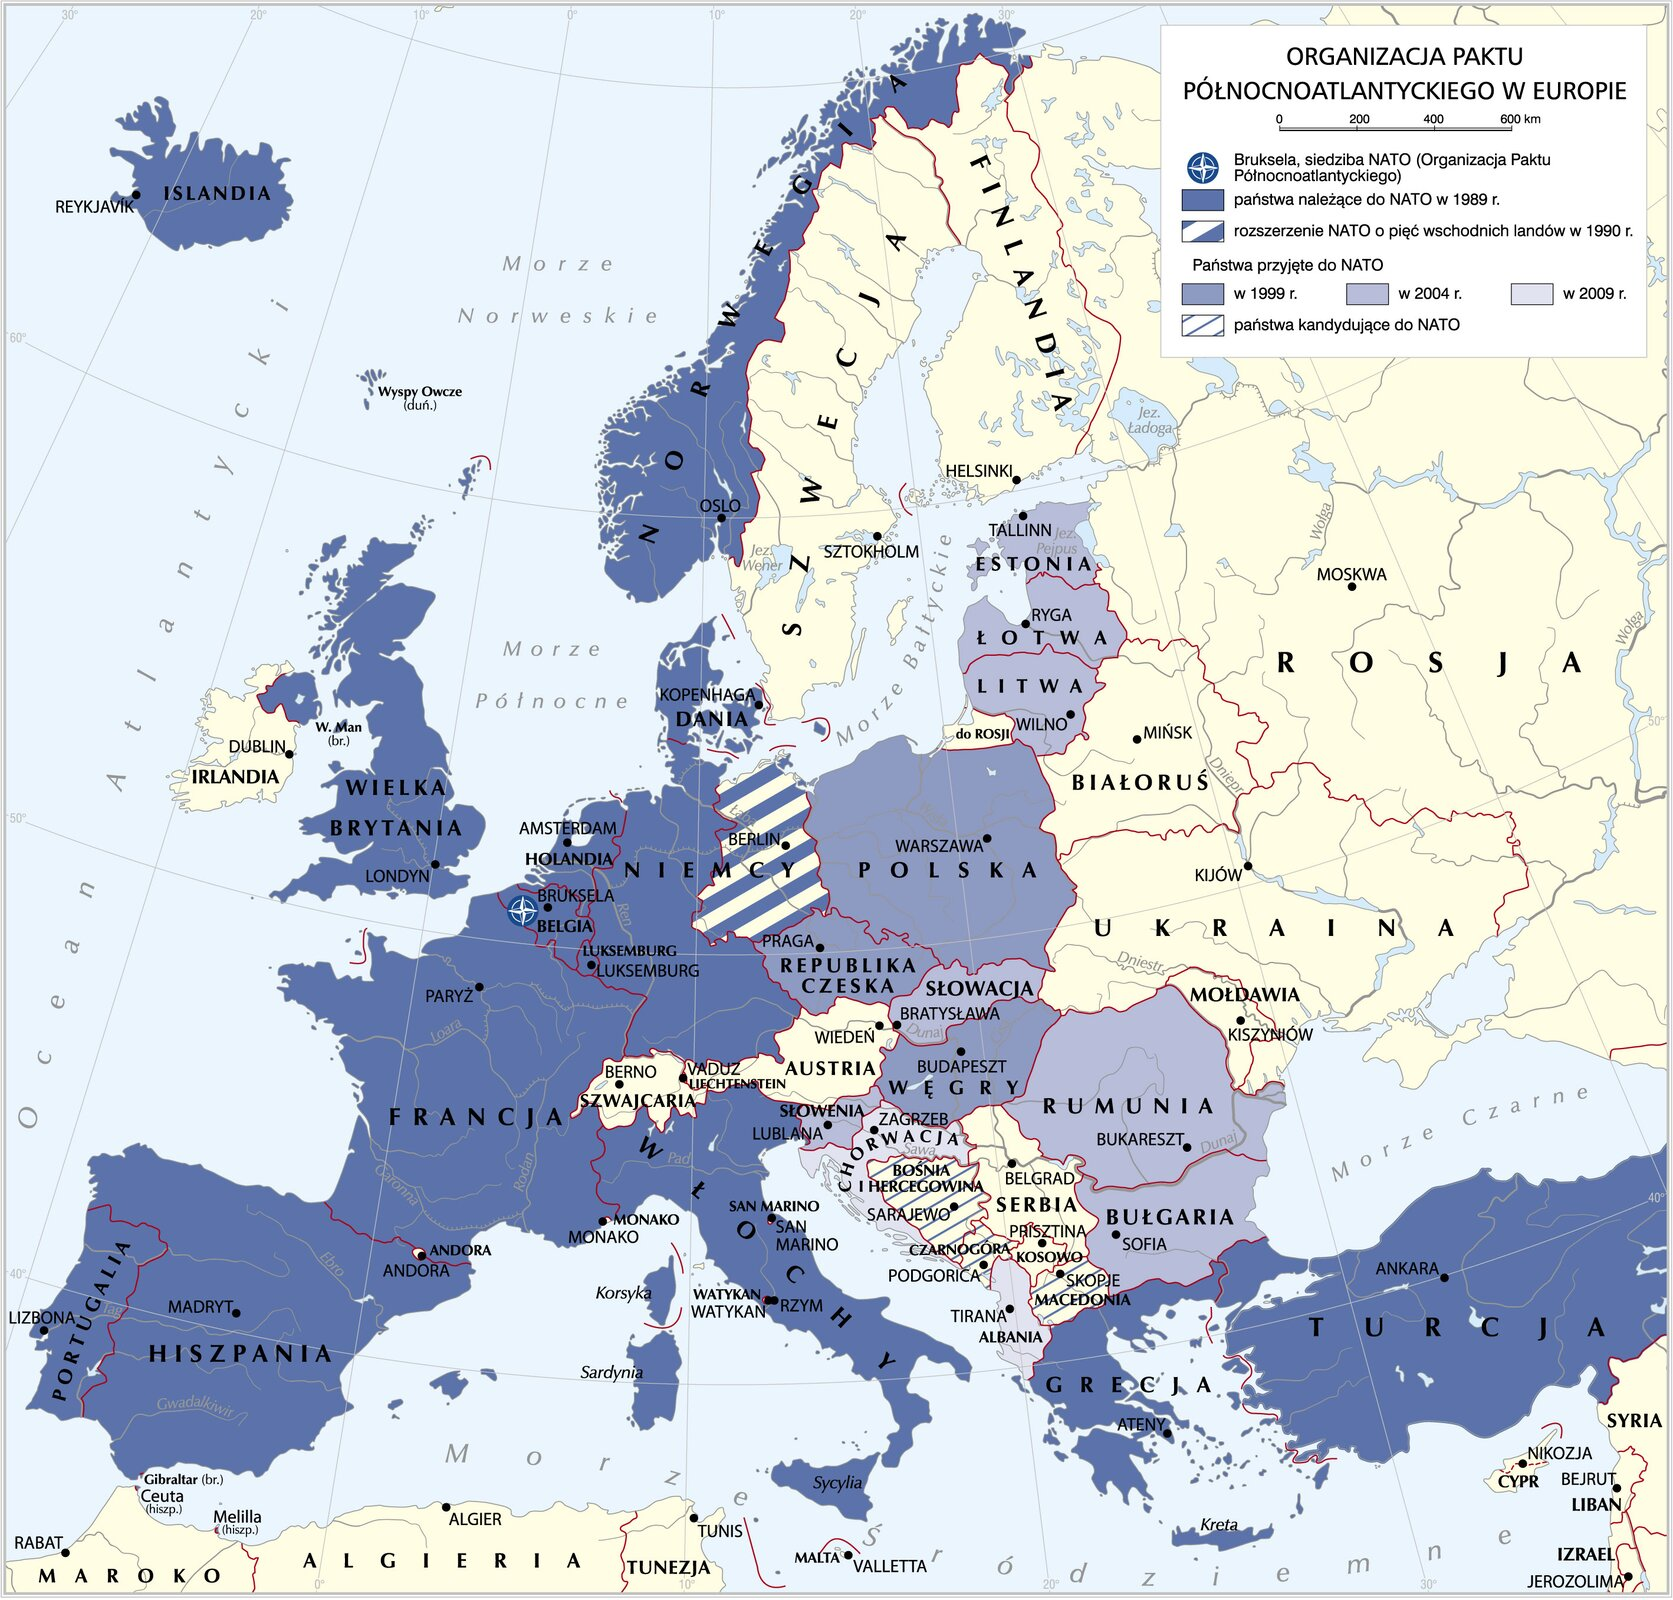 mapaNATO wEuropie